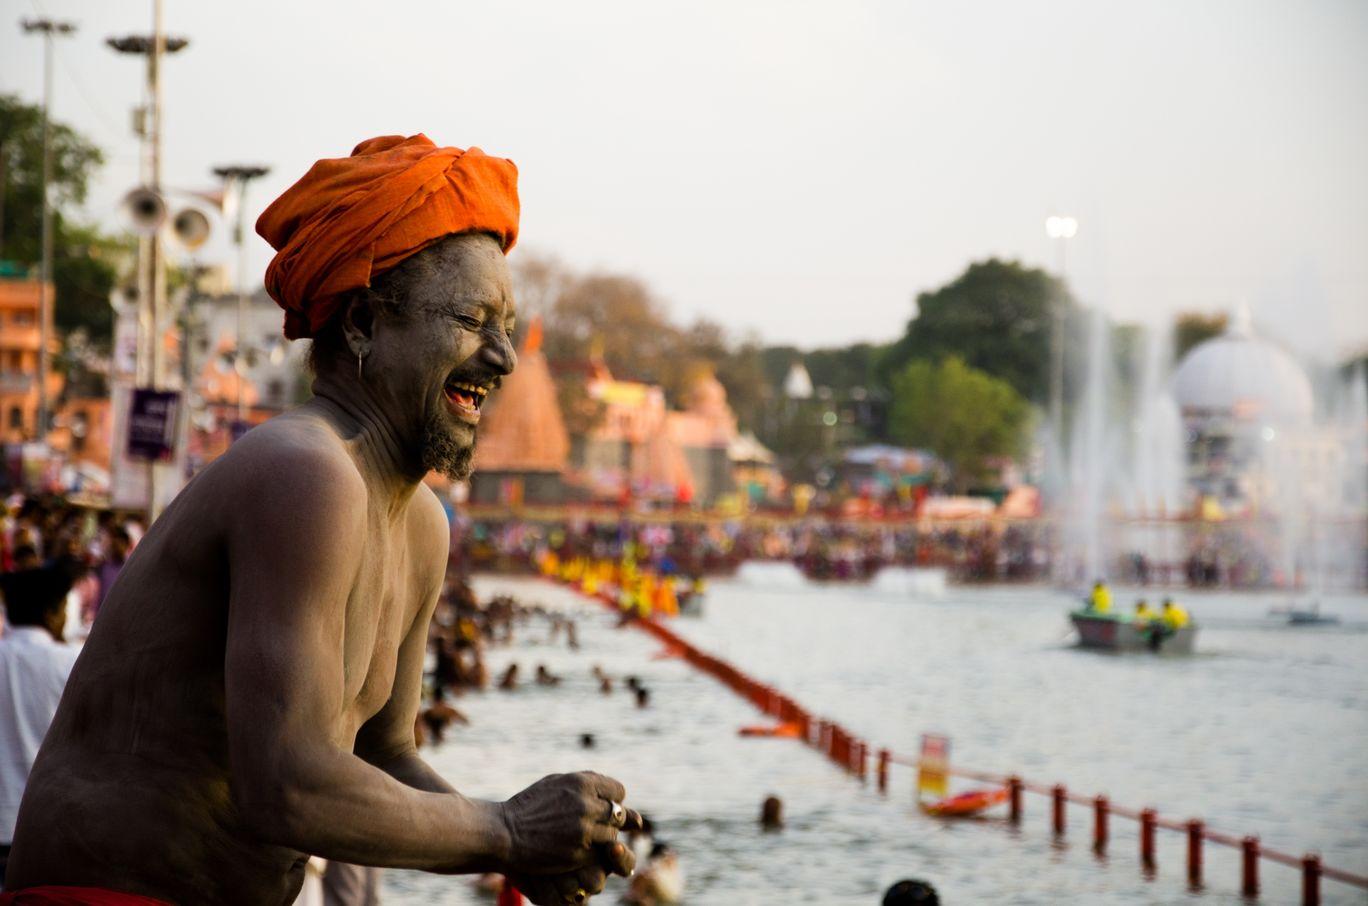 Photo of Ujjain By Harshavardhan Sappati